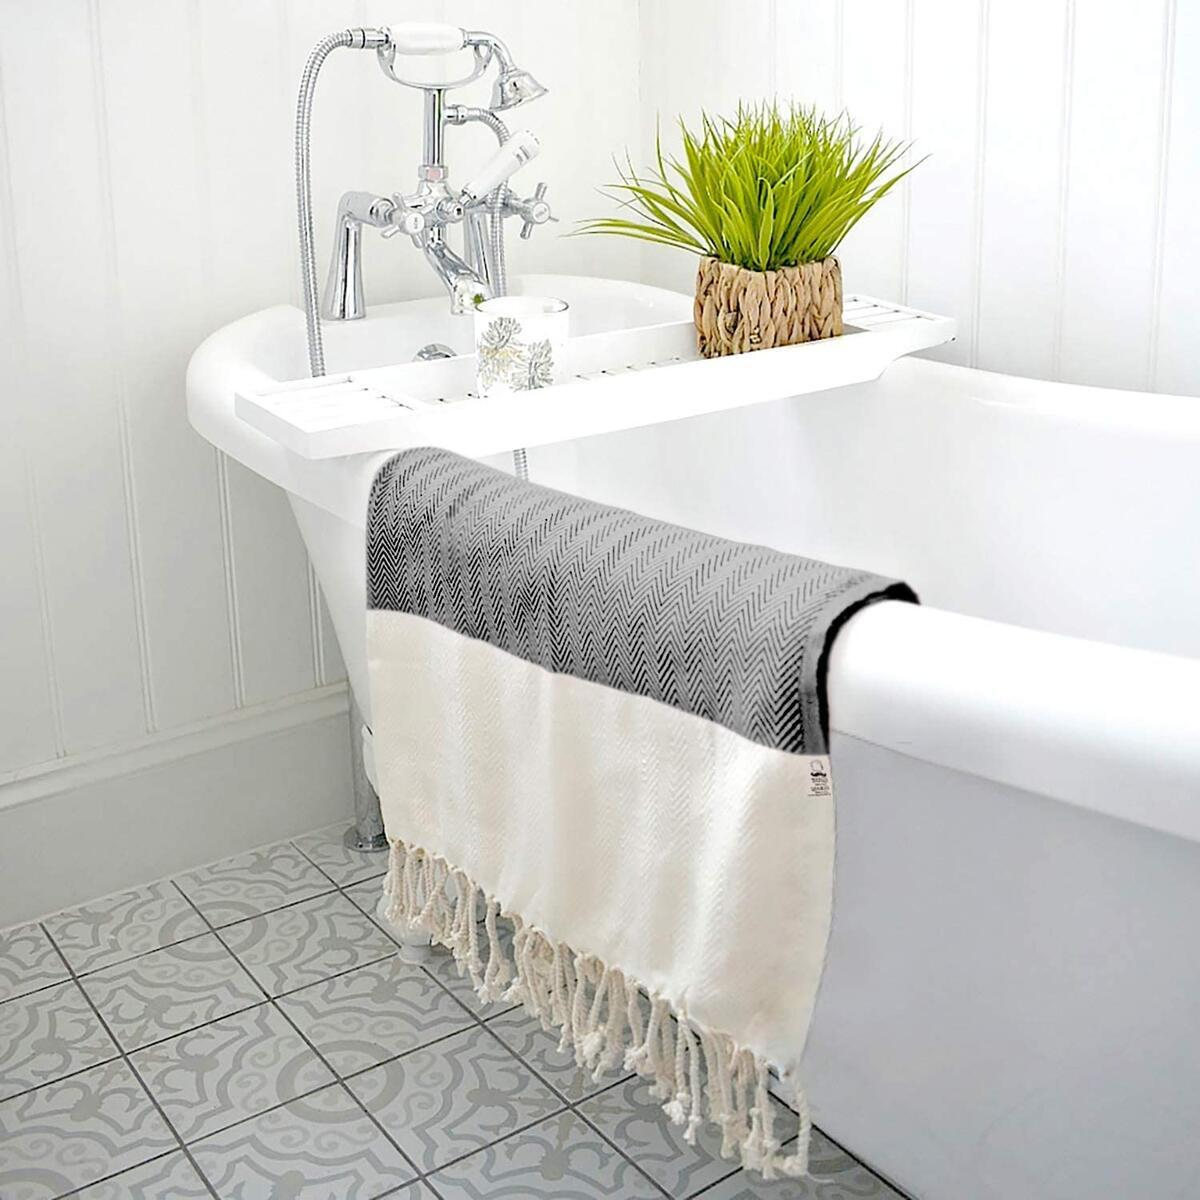 Herringbone Turkish Towel 100% Cotton Beach Towel 74x35 inch (BLACK)